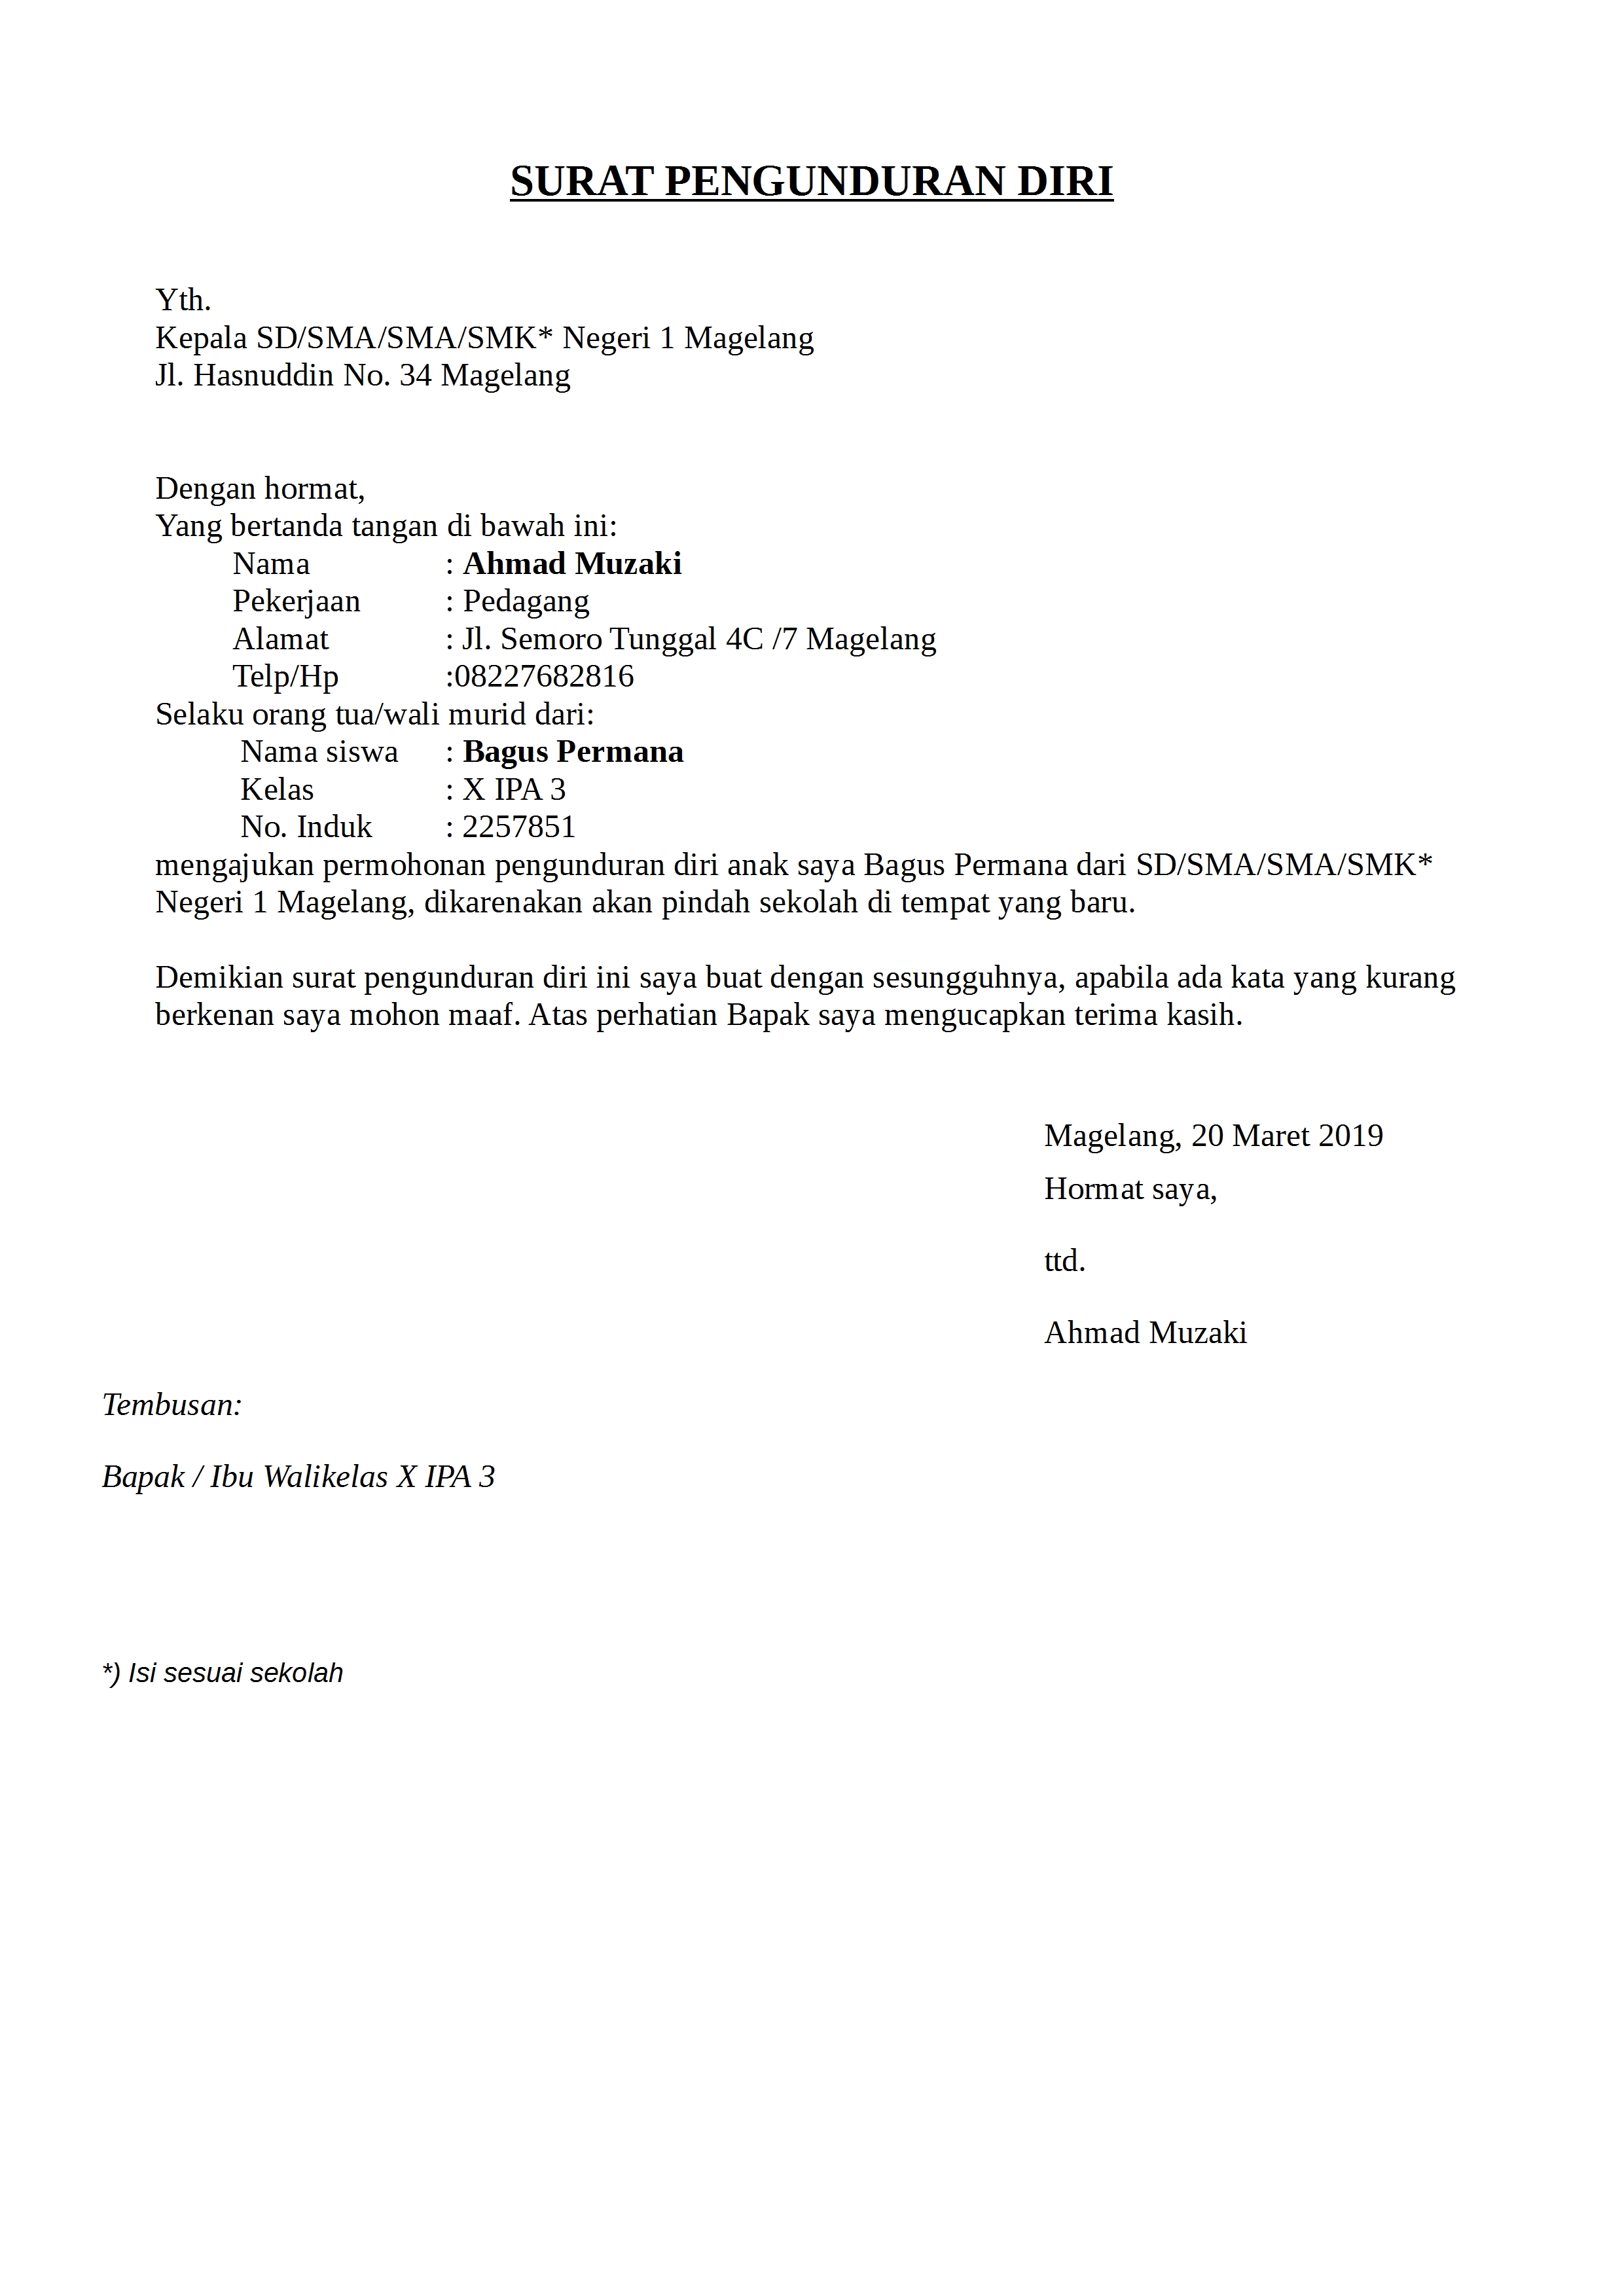 Contoh Surat Pengunduran Diri Guru : contoh, surat, pengunduran, Contoh, Surat, Pengunduran, Gurudoc, Kumpulan